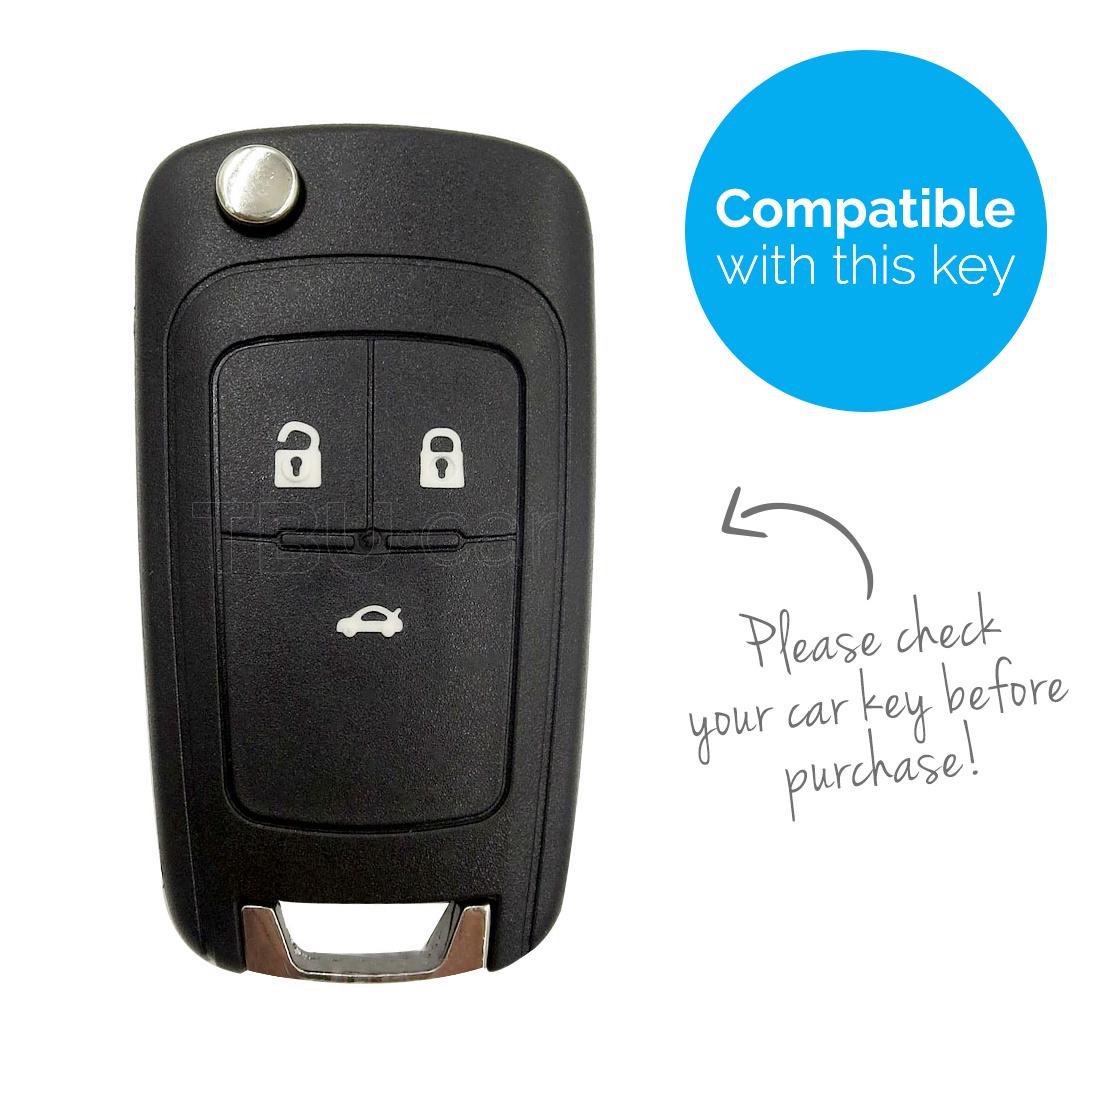 TBU car TBU car Sleutel cover compatibel met Chevrolet - Silicone sleutelhoesje - beschermhoesje autosleutel - Wit